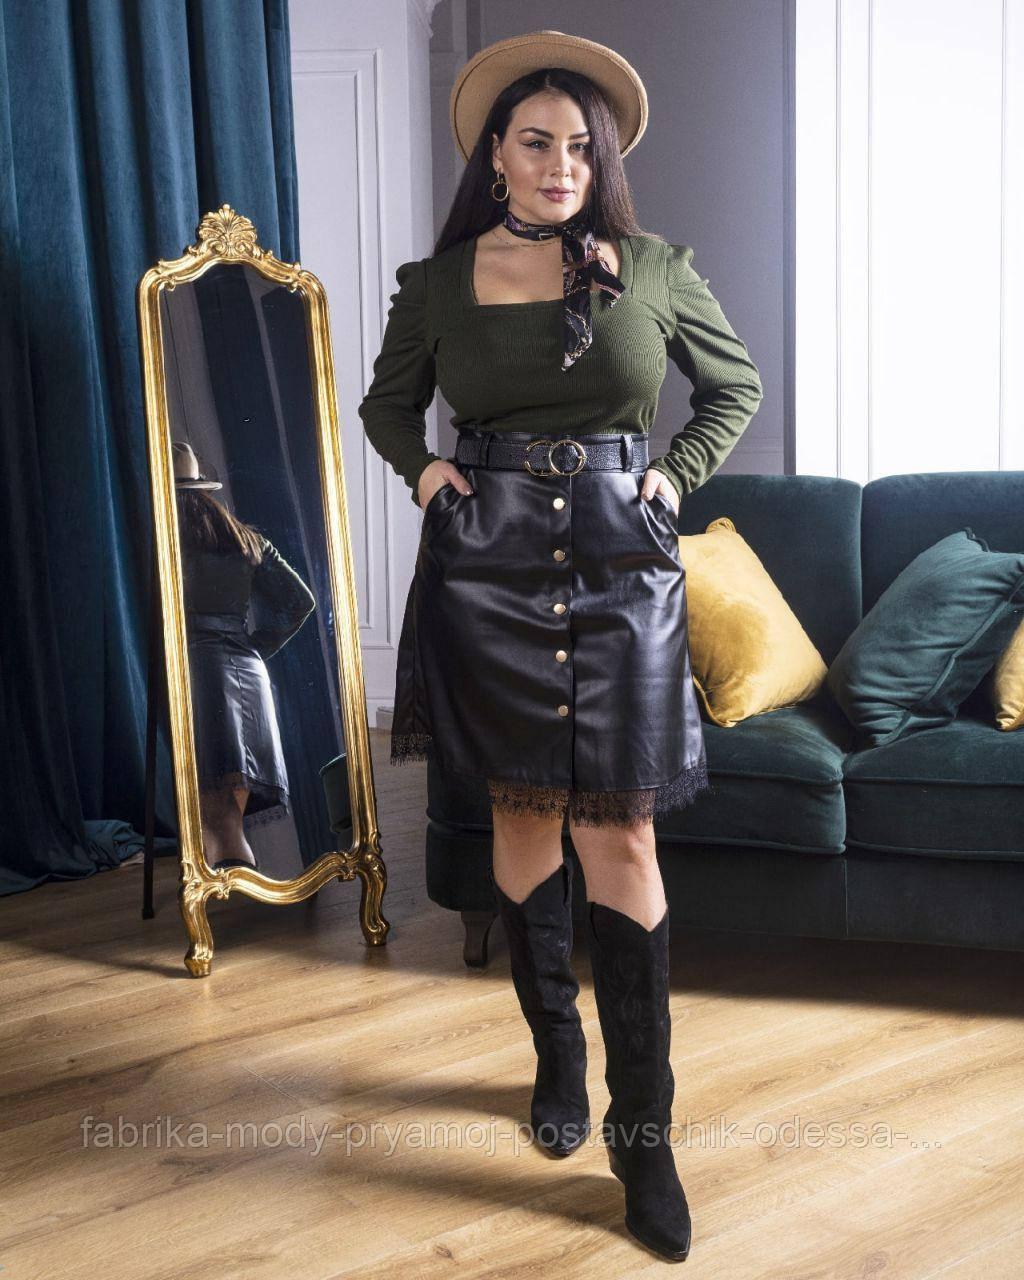 Женская юбка кожаная короткая мод.740 Анна Оди размер 42/60